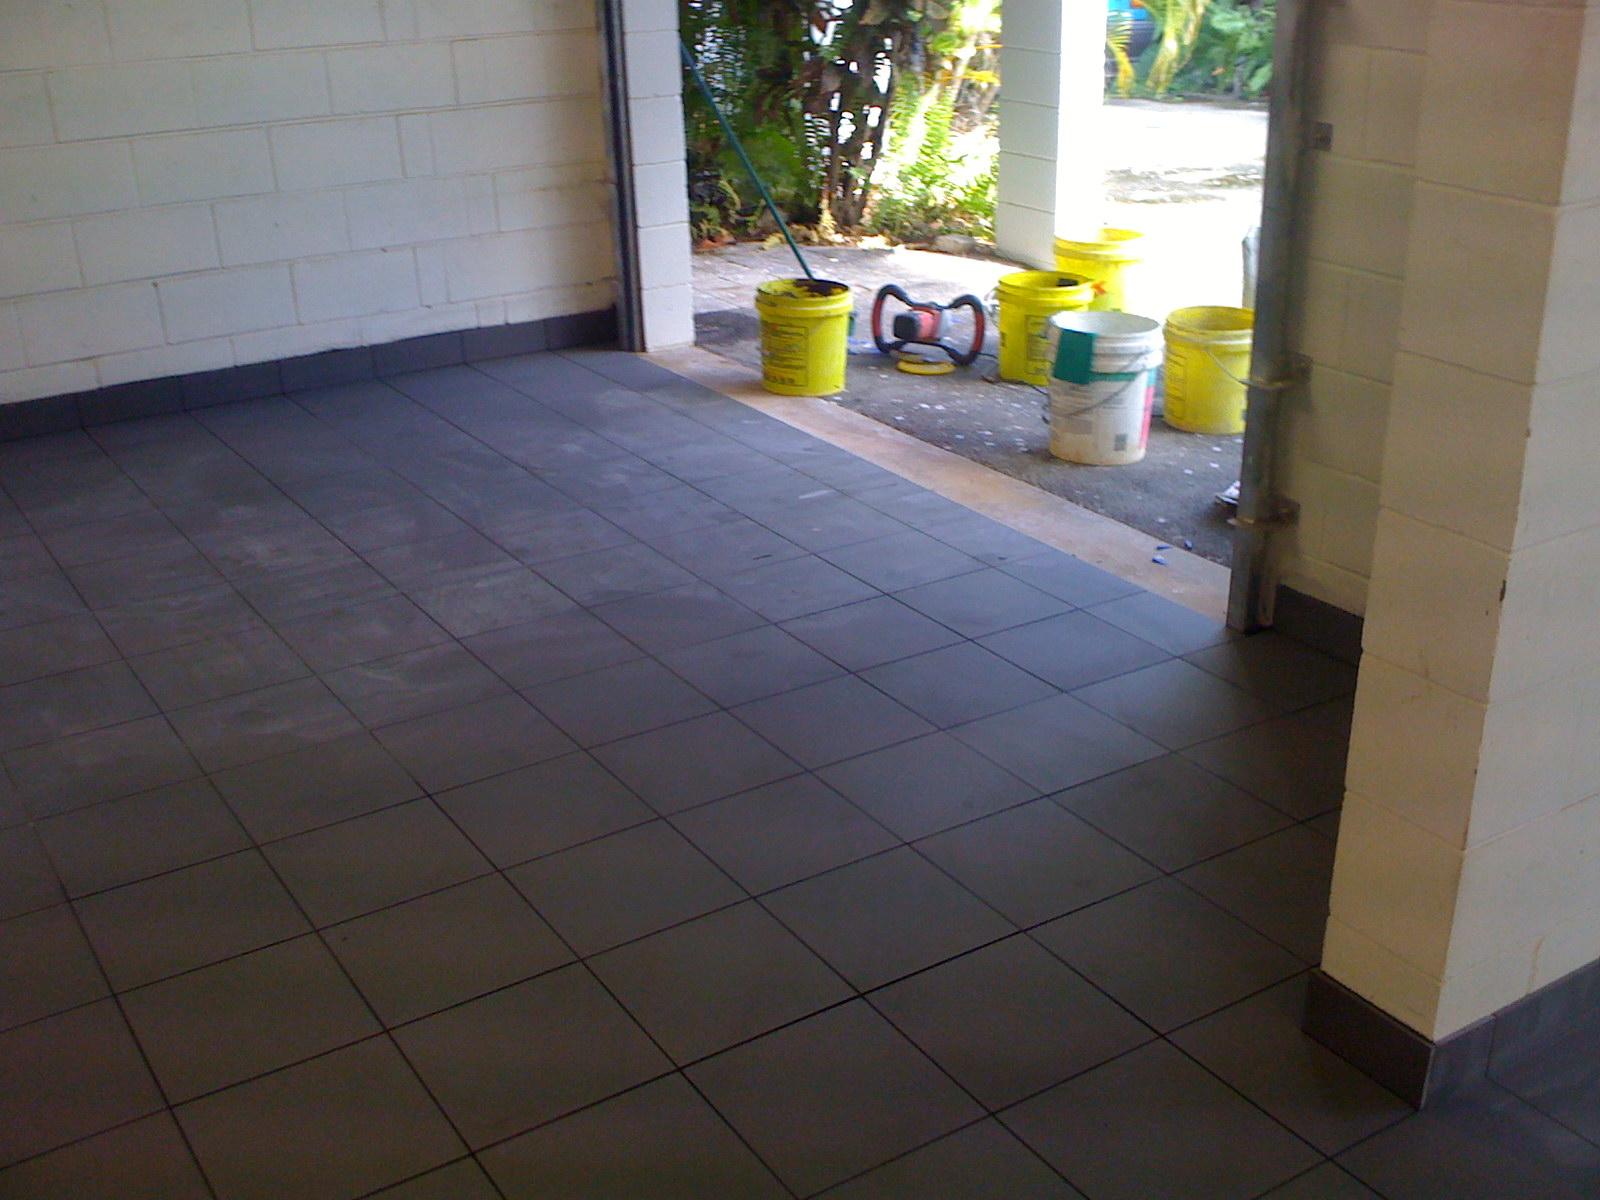 carport tiles installed